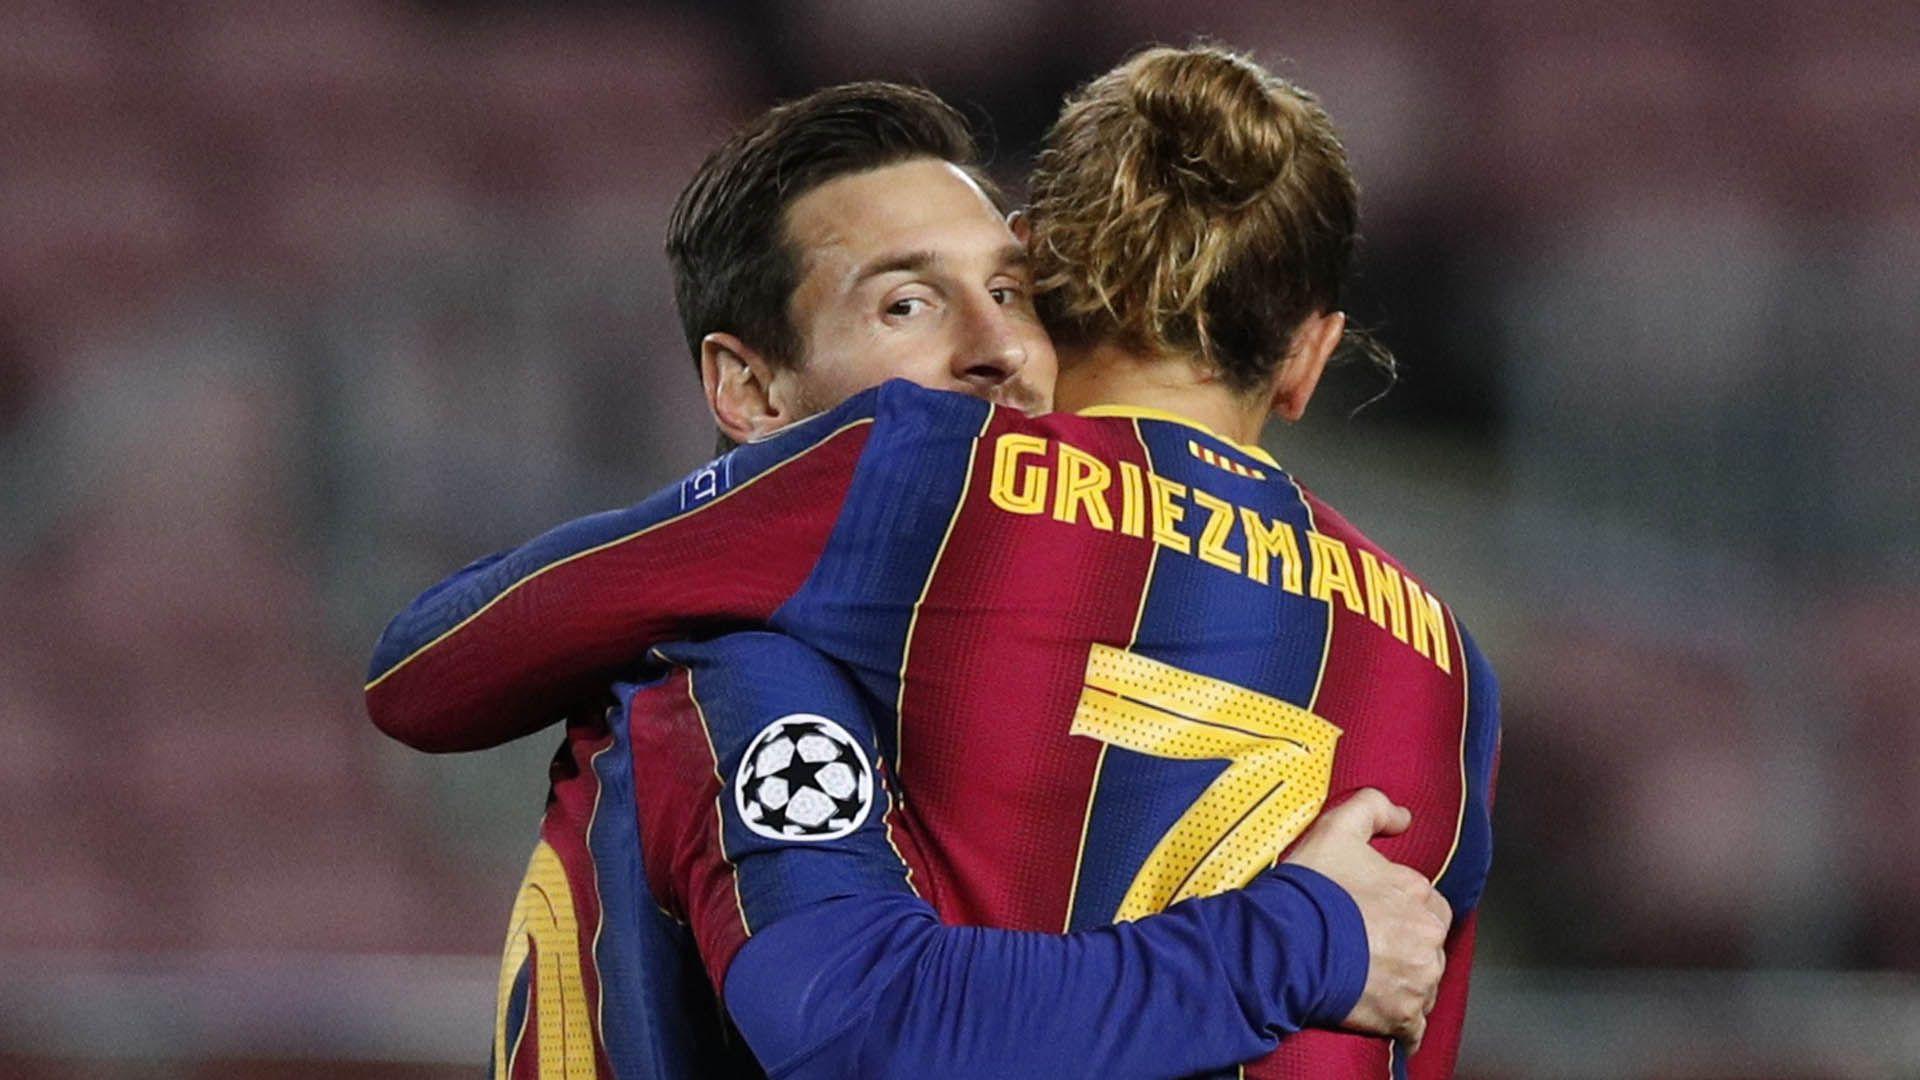 Champions League - Group G - FC Barcelona v Dynamo Kyiv